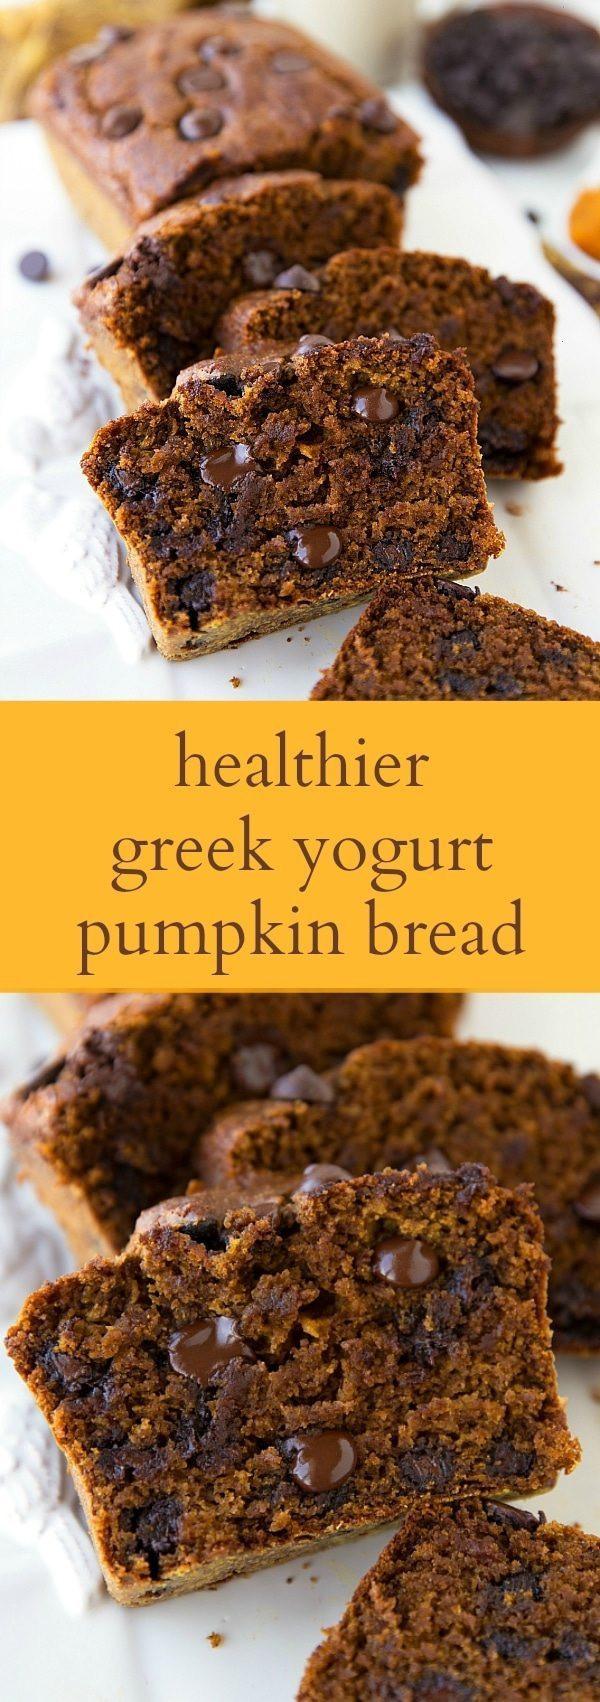 Healthy Pumpkin Bread With Yogurt  The BEST Healthy Greek Yogurt Pumpkin Bread